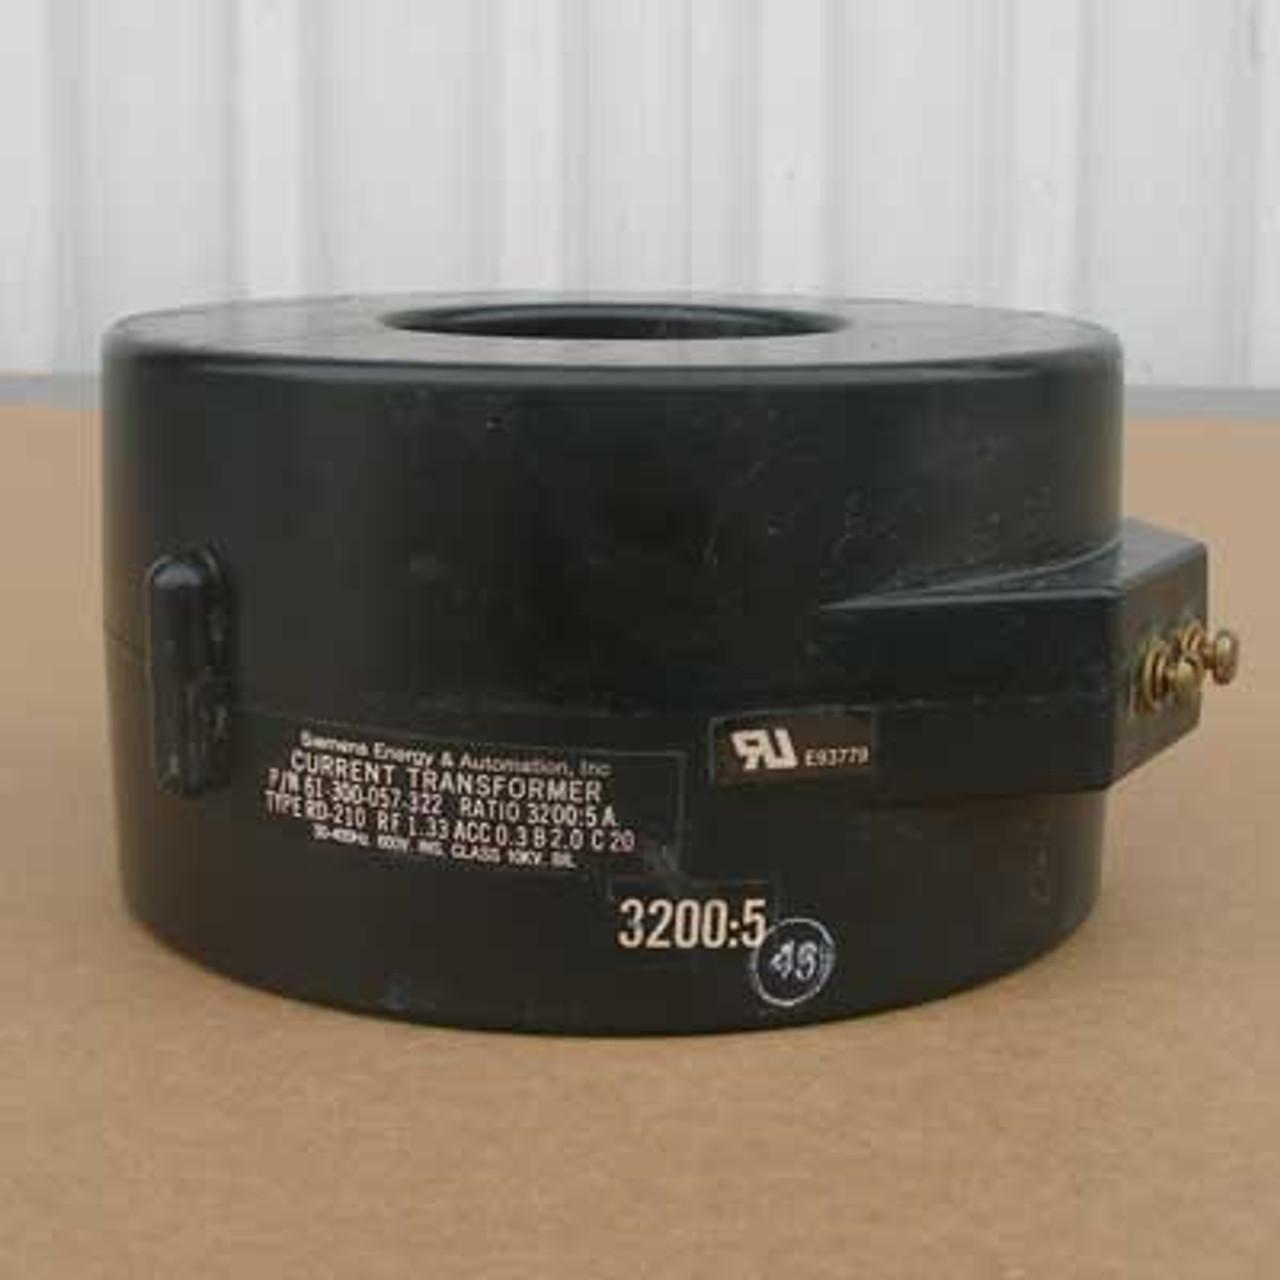 Siemens 61-300-057-322 3200:5A 50-400Hz Current Transformer - Used